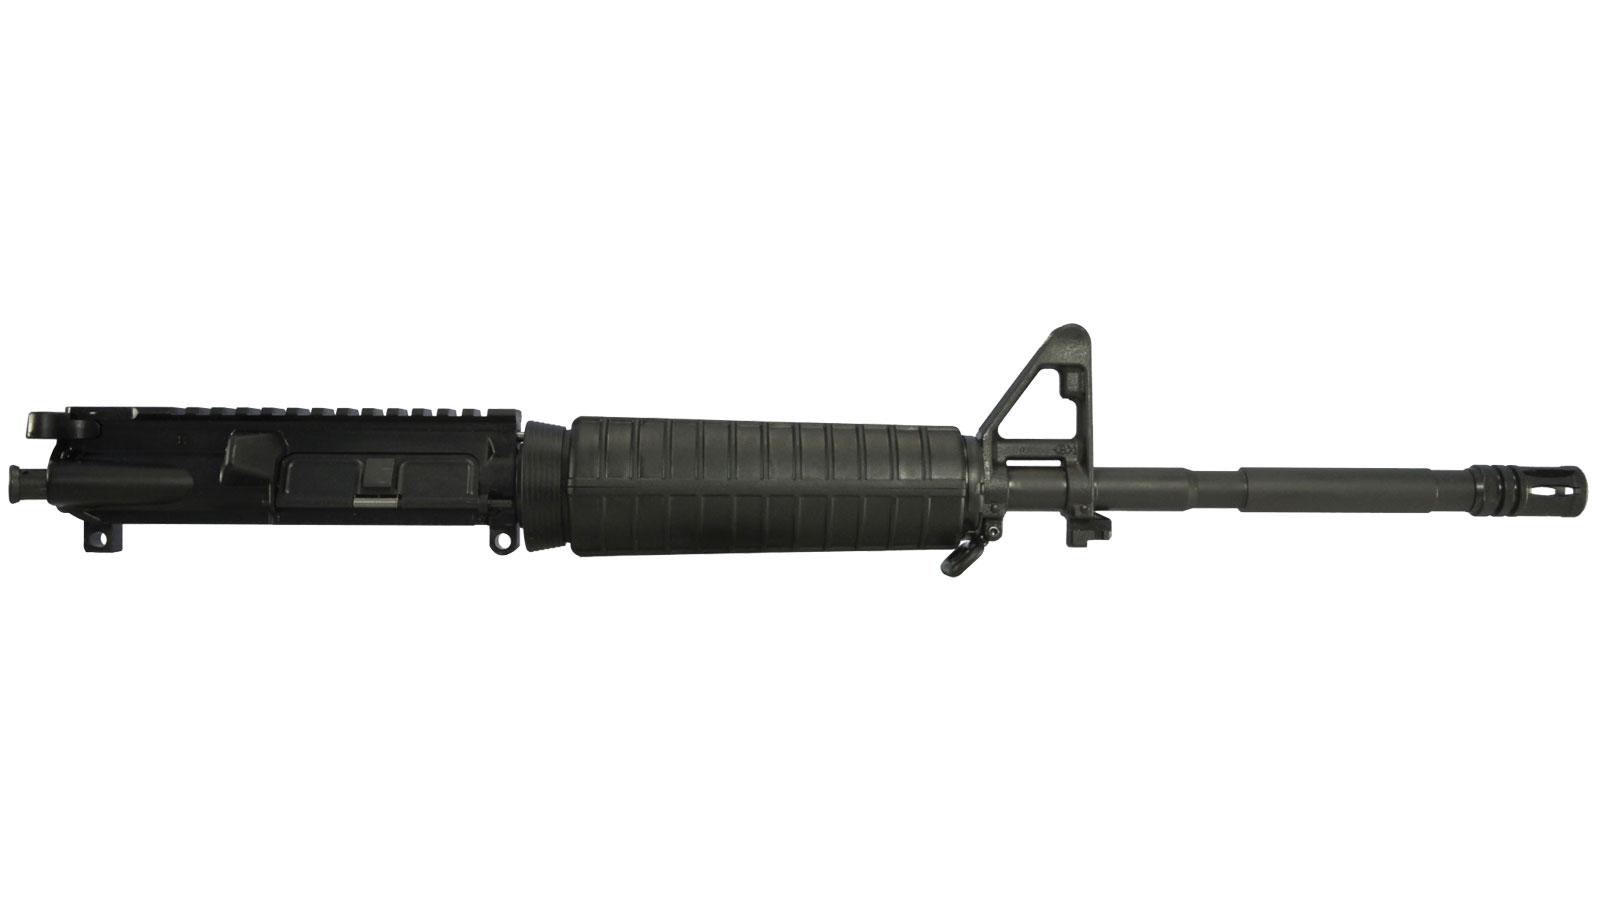 Bushmaster 91823 Patrolmans Carbine (M4 A3) Complete Upper 223 Remington 5.56 NATO 16 FH 4150 Chrome Moly Vanadium Steel Chrome-Lined Black Brl Finish in.